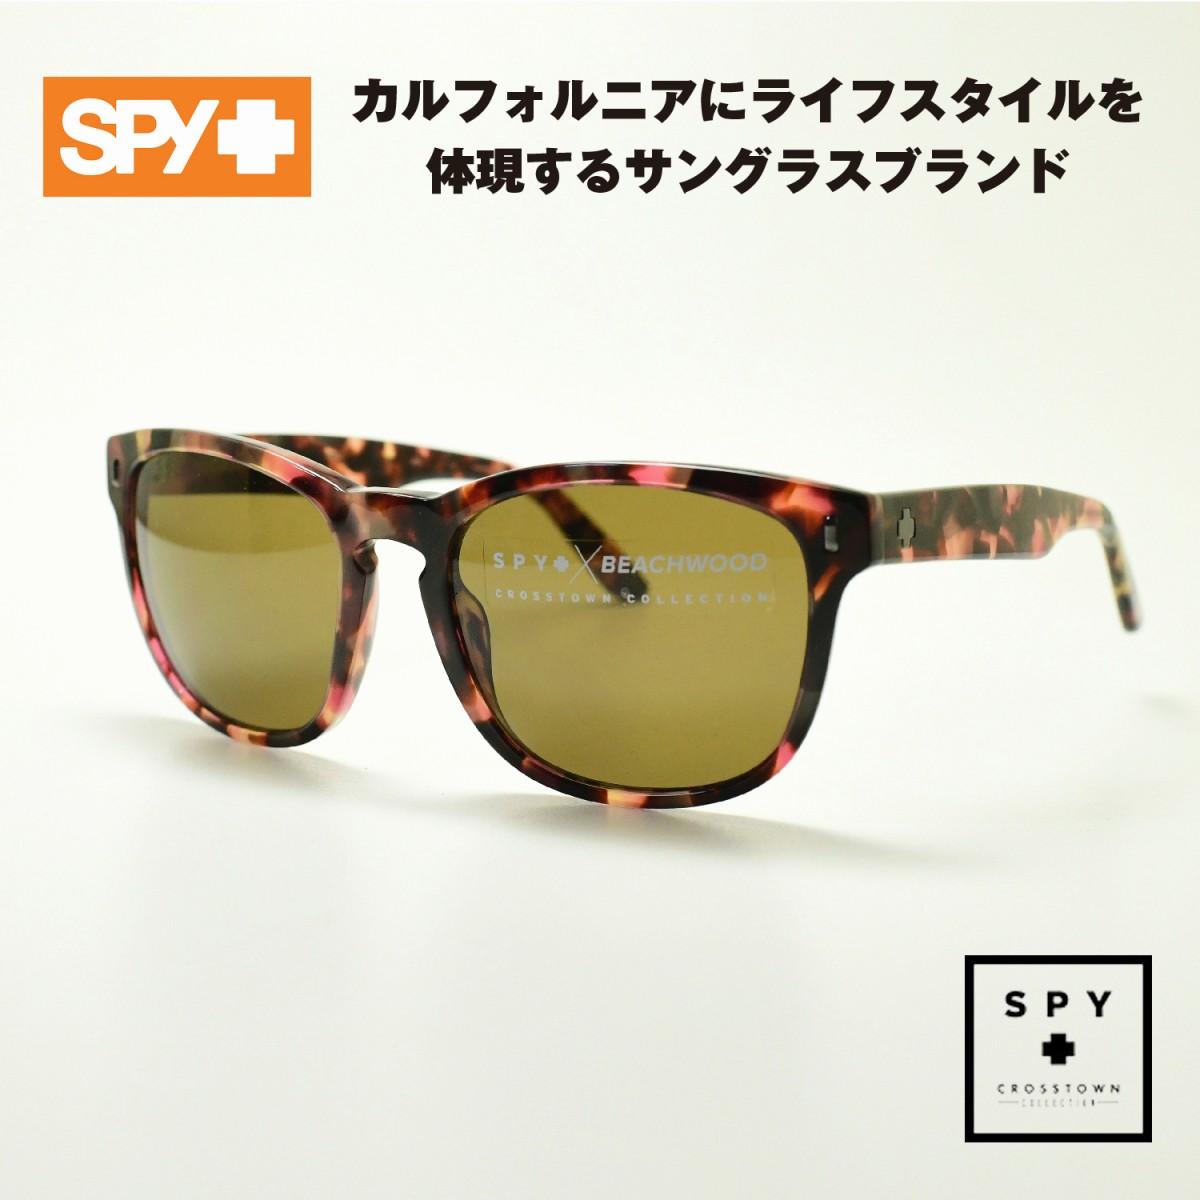 SPY スパイBEACHWOOD ビーチウッド(チェリーウッド/ブロンズ)